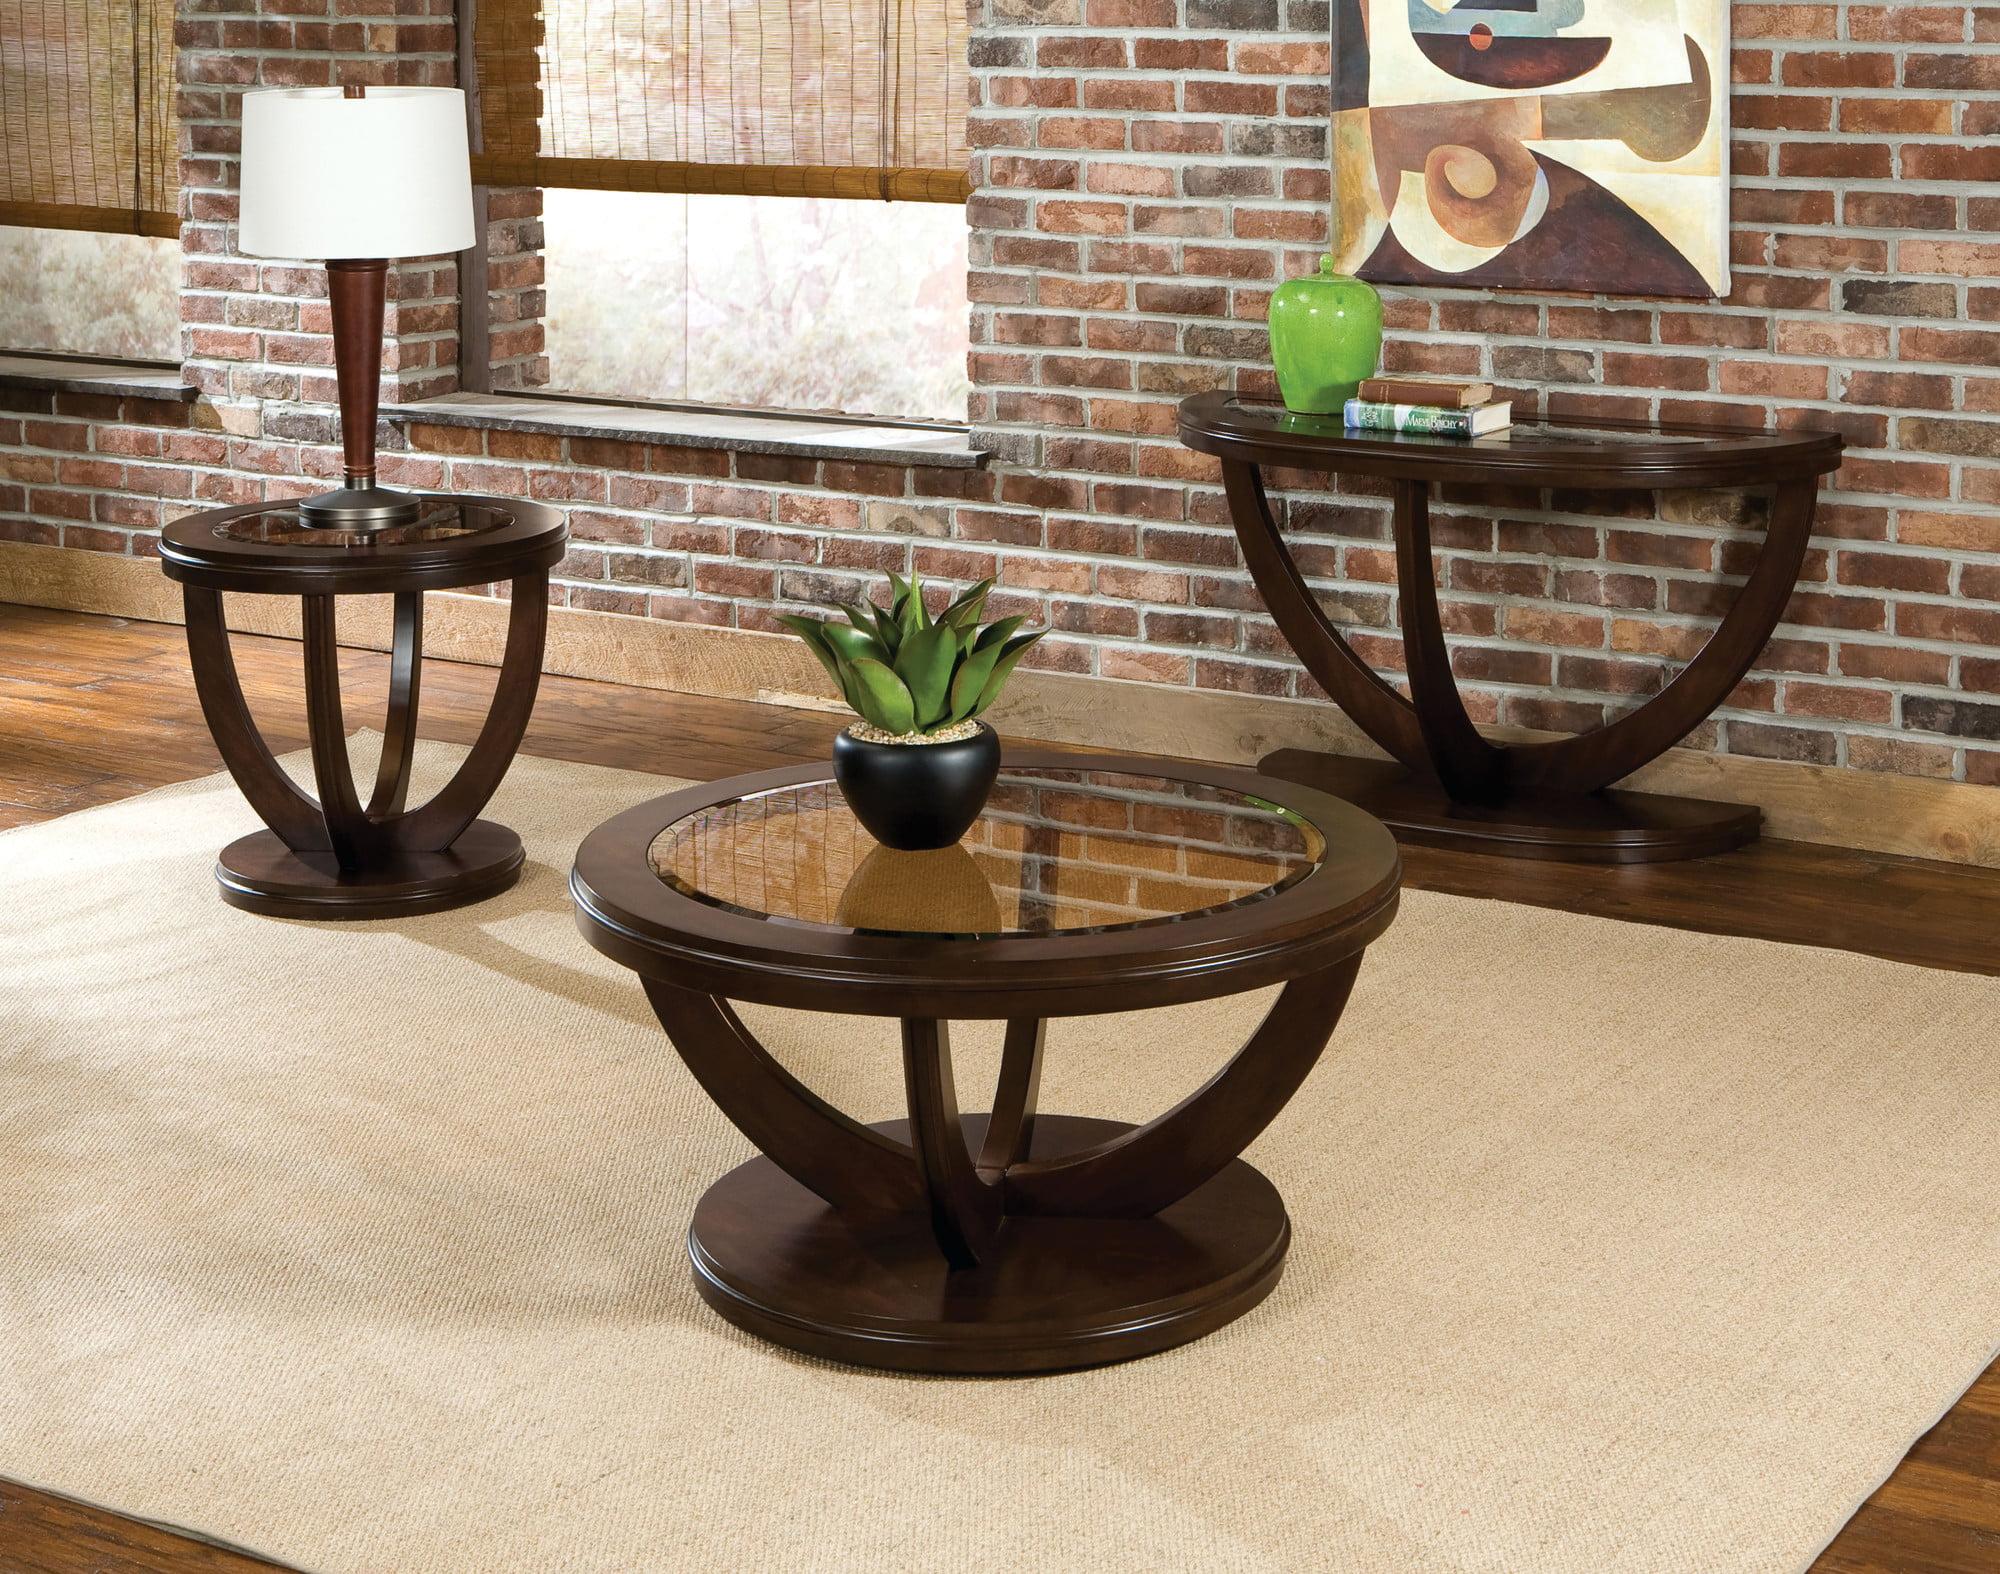 Standard Furniture La Jolla Round Tail Table